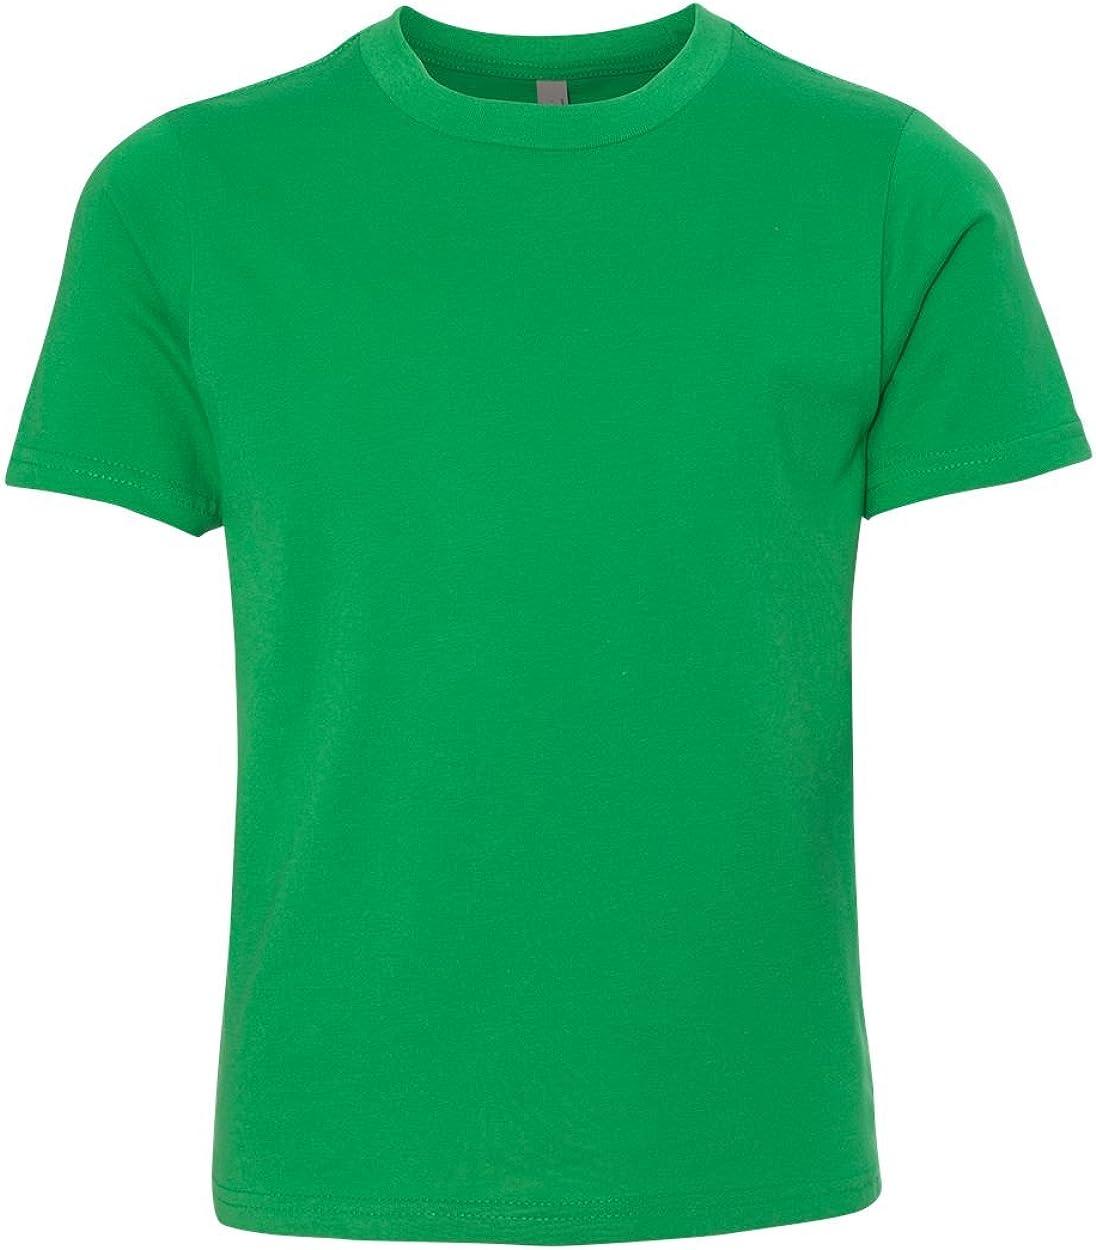 Youth Premium Short Sleeve Crew 3310 Boys/' Girls/' T-Shirt Tee Next Level